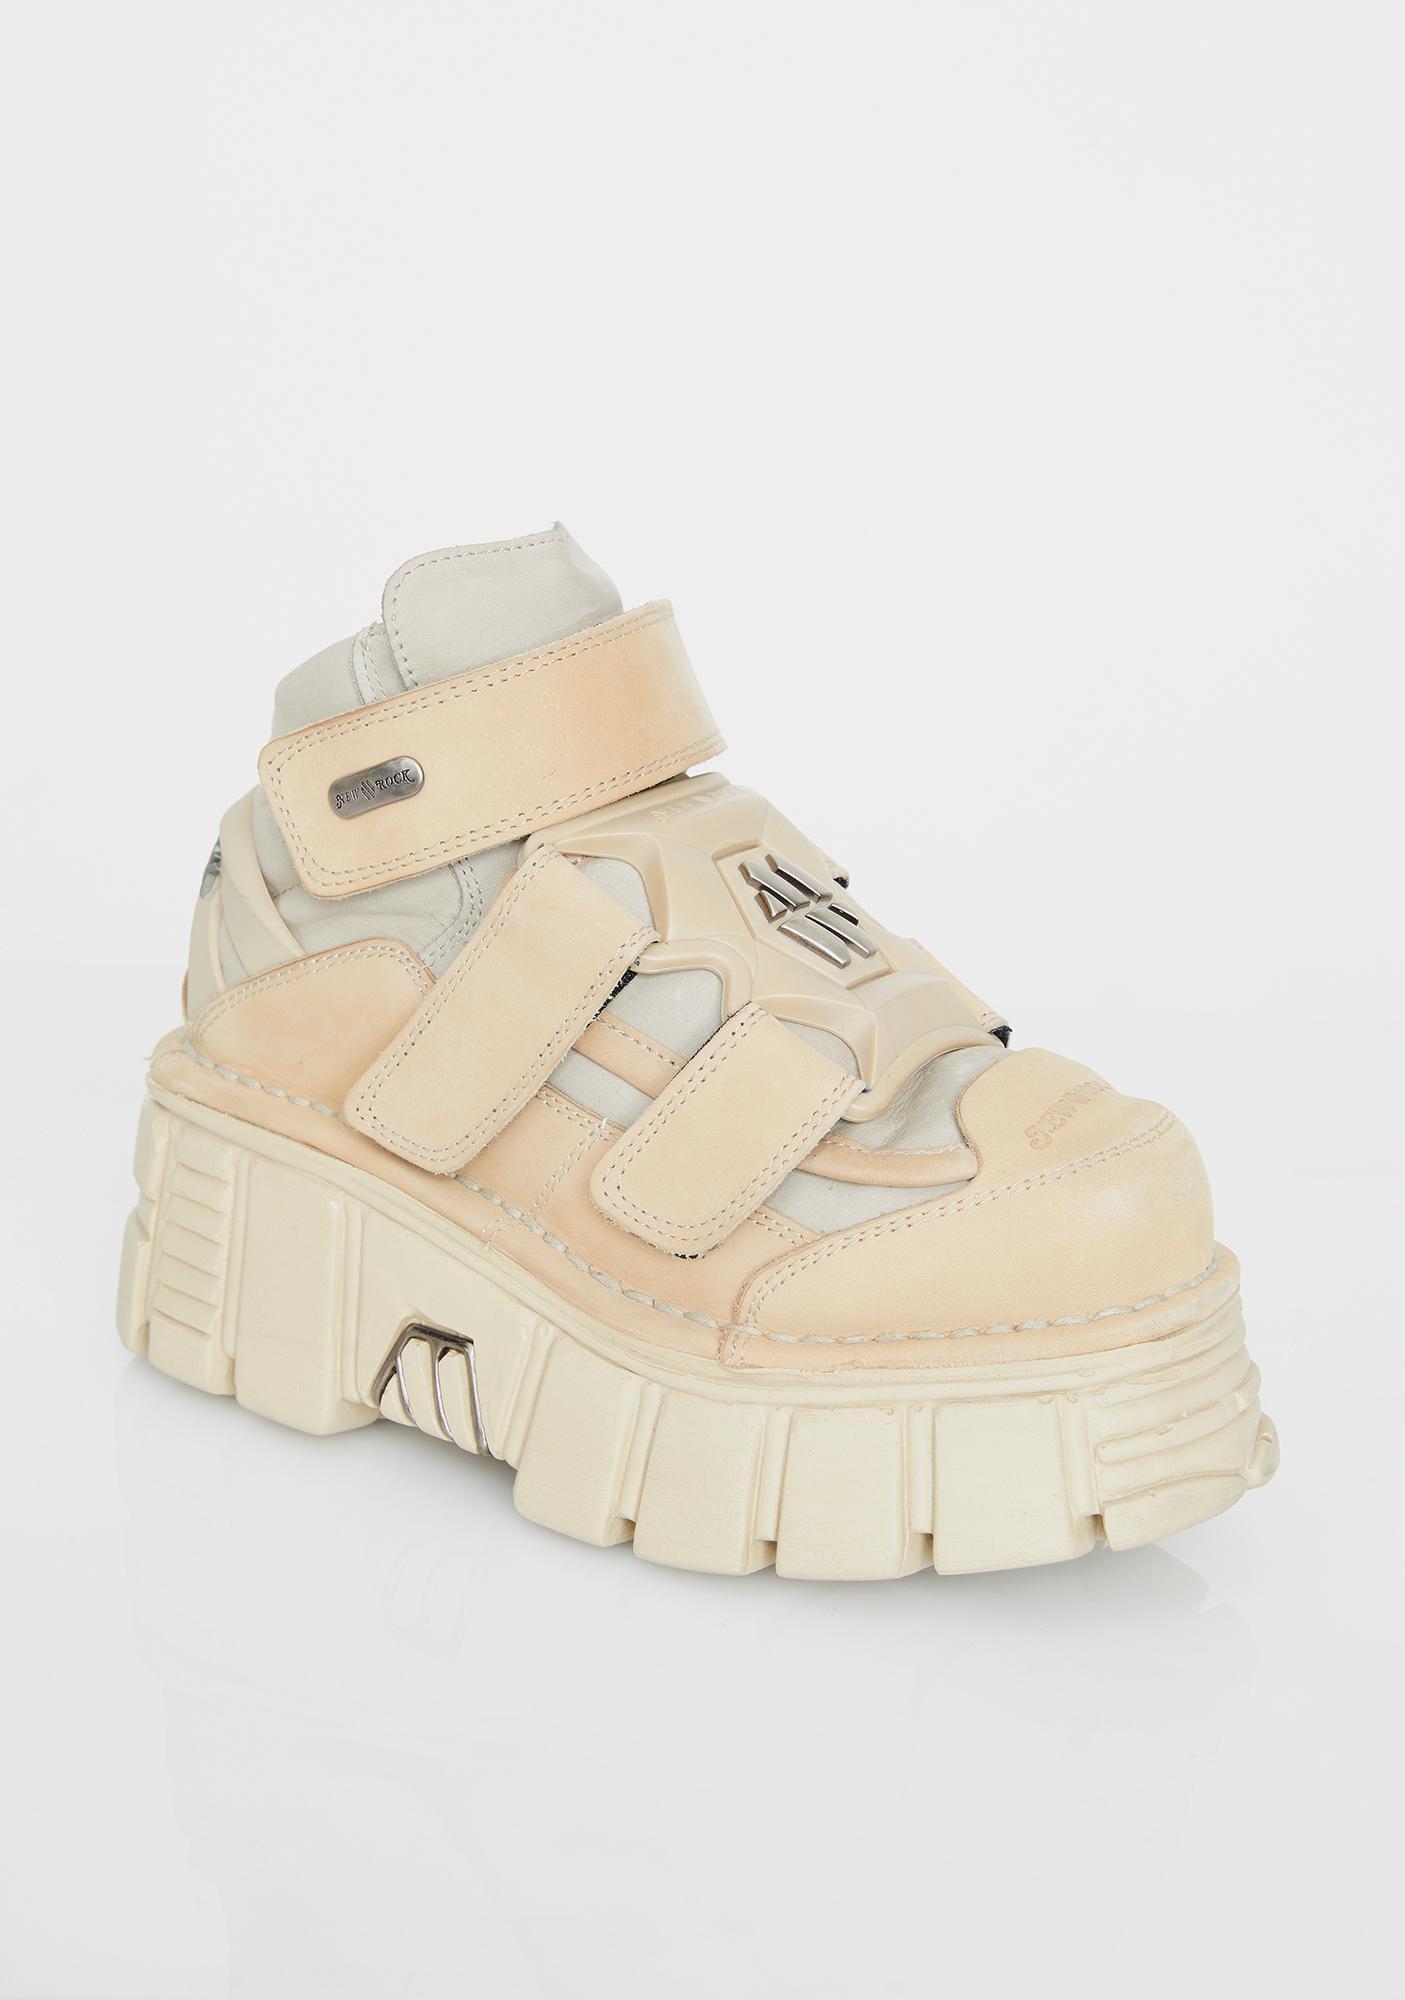 New Rock Softy Safari Boots